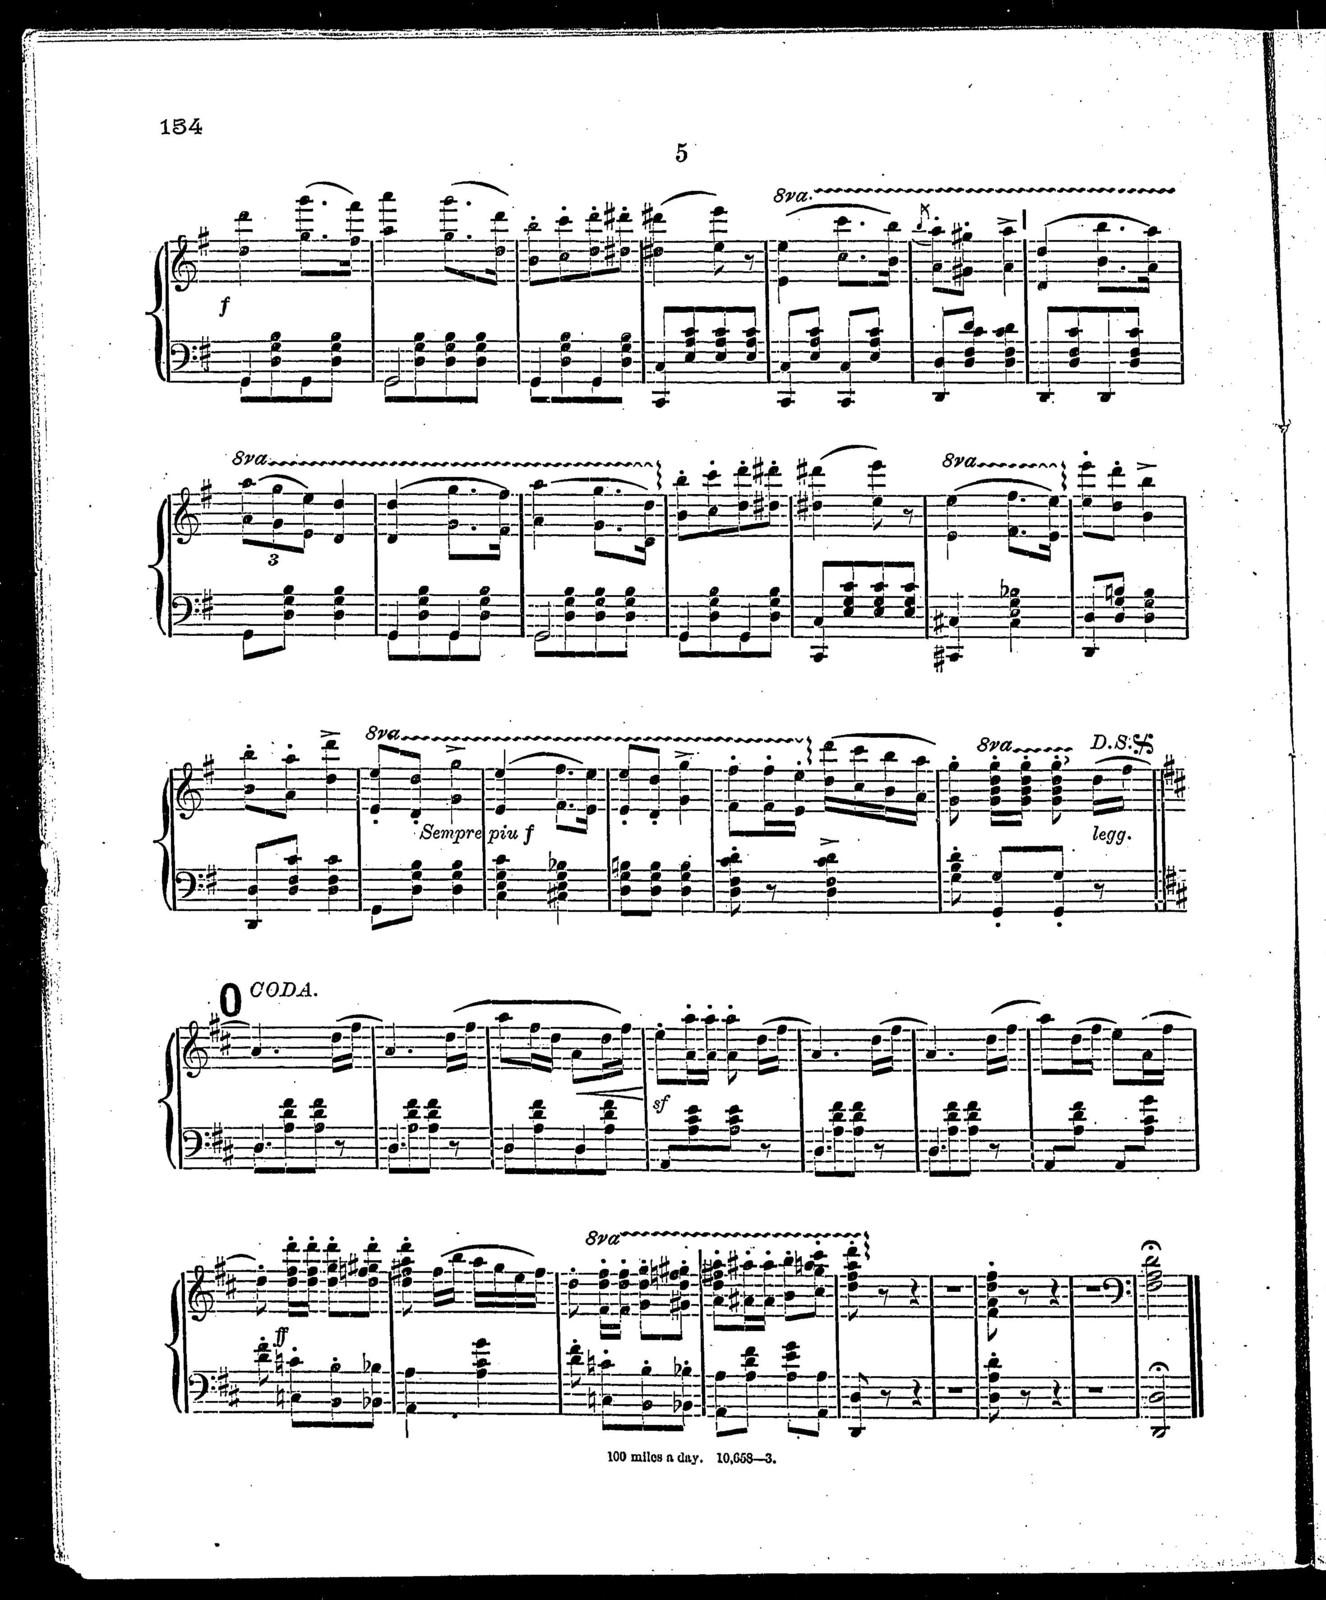 Peters' palor music